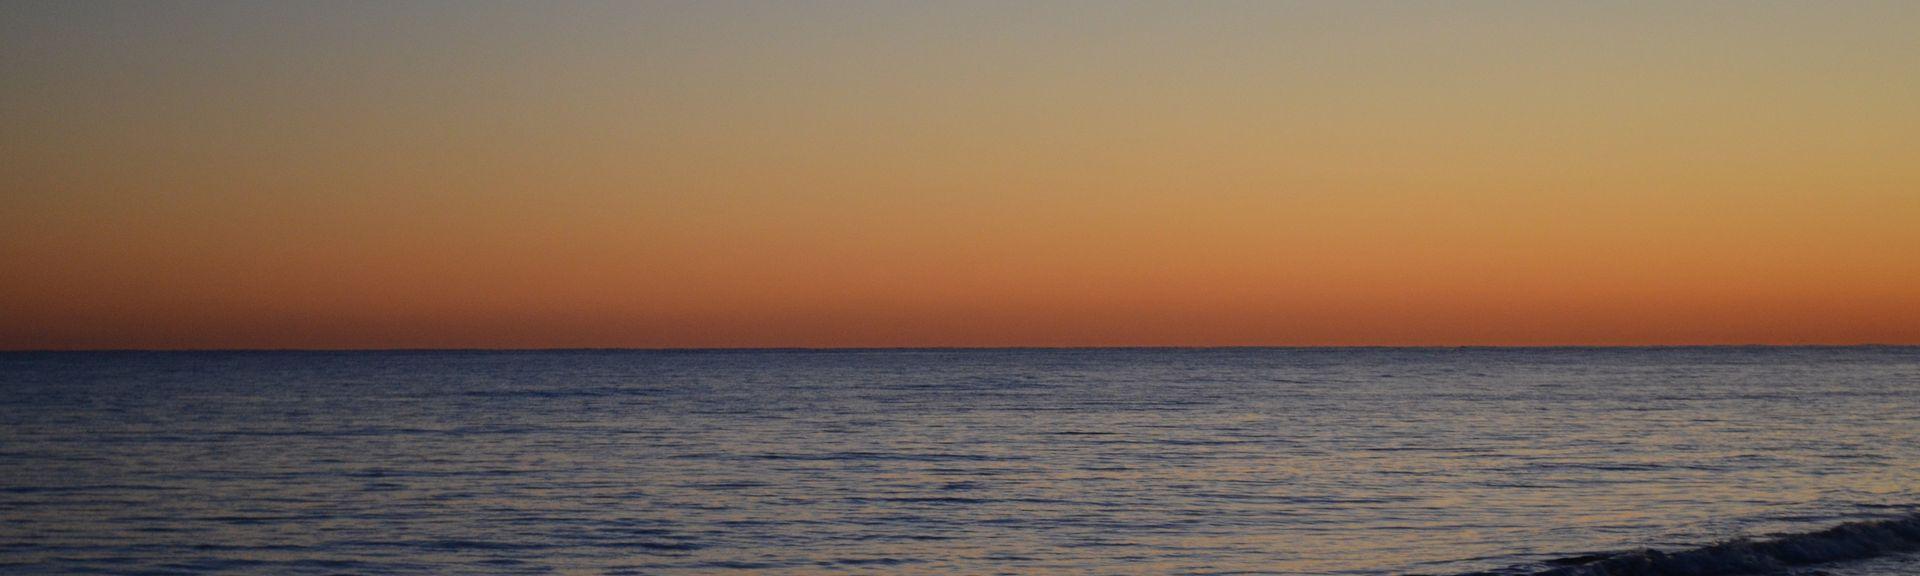 Palm Beach, Orange Beach, Alabama, United States of America